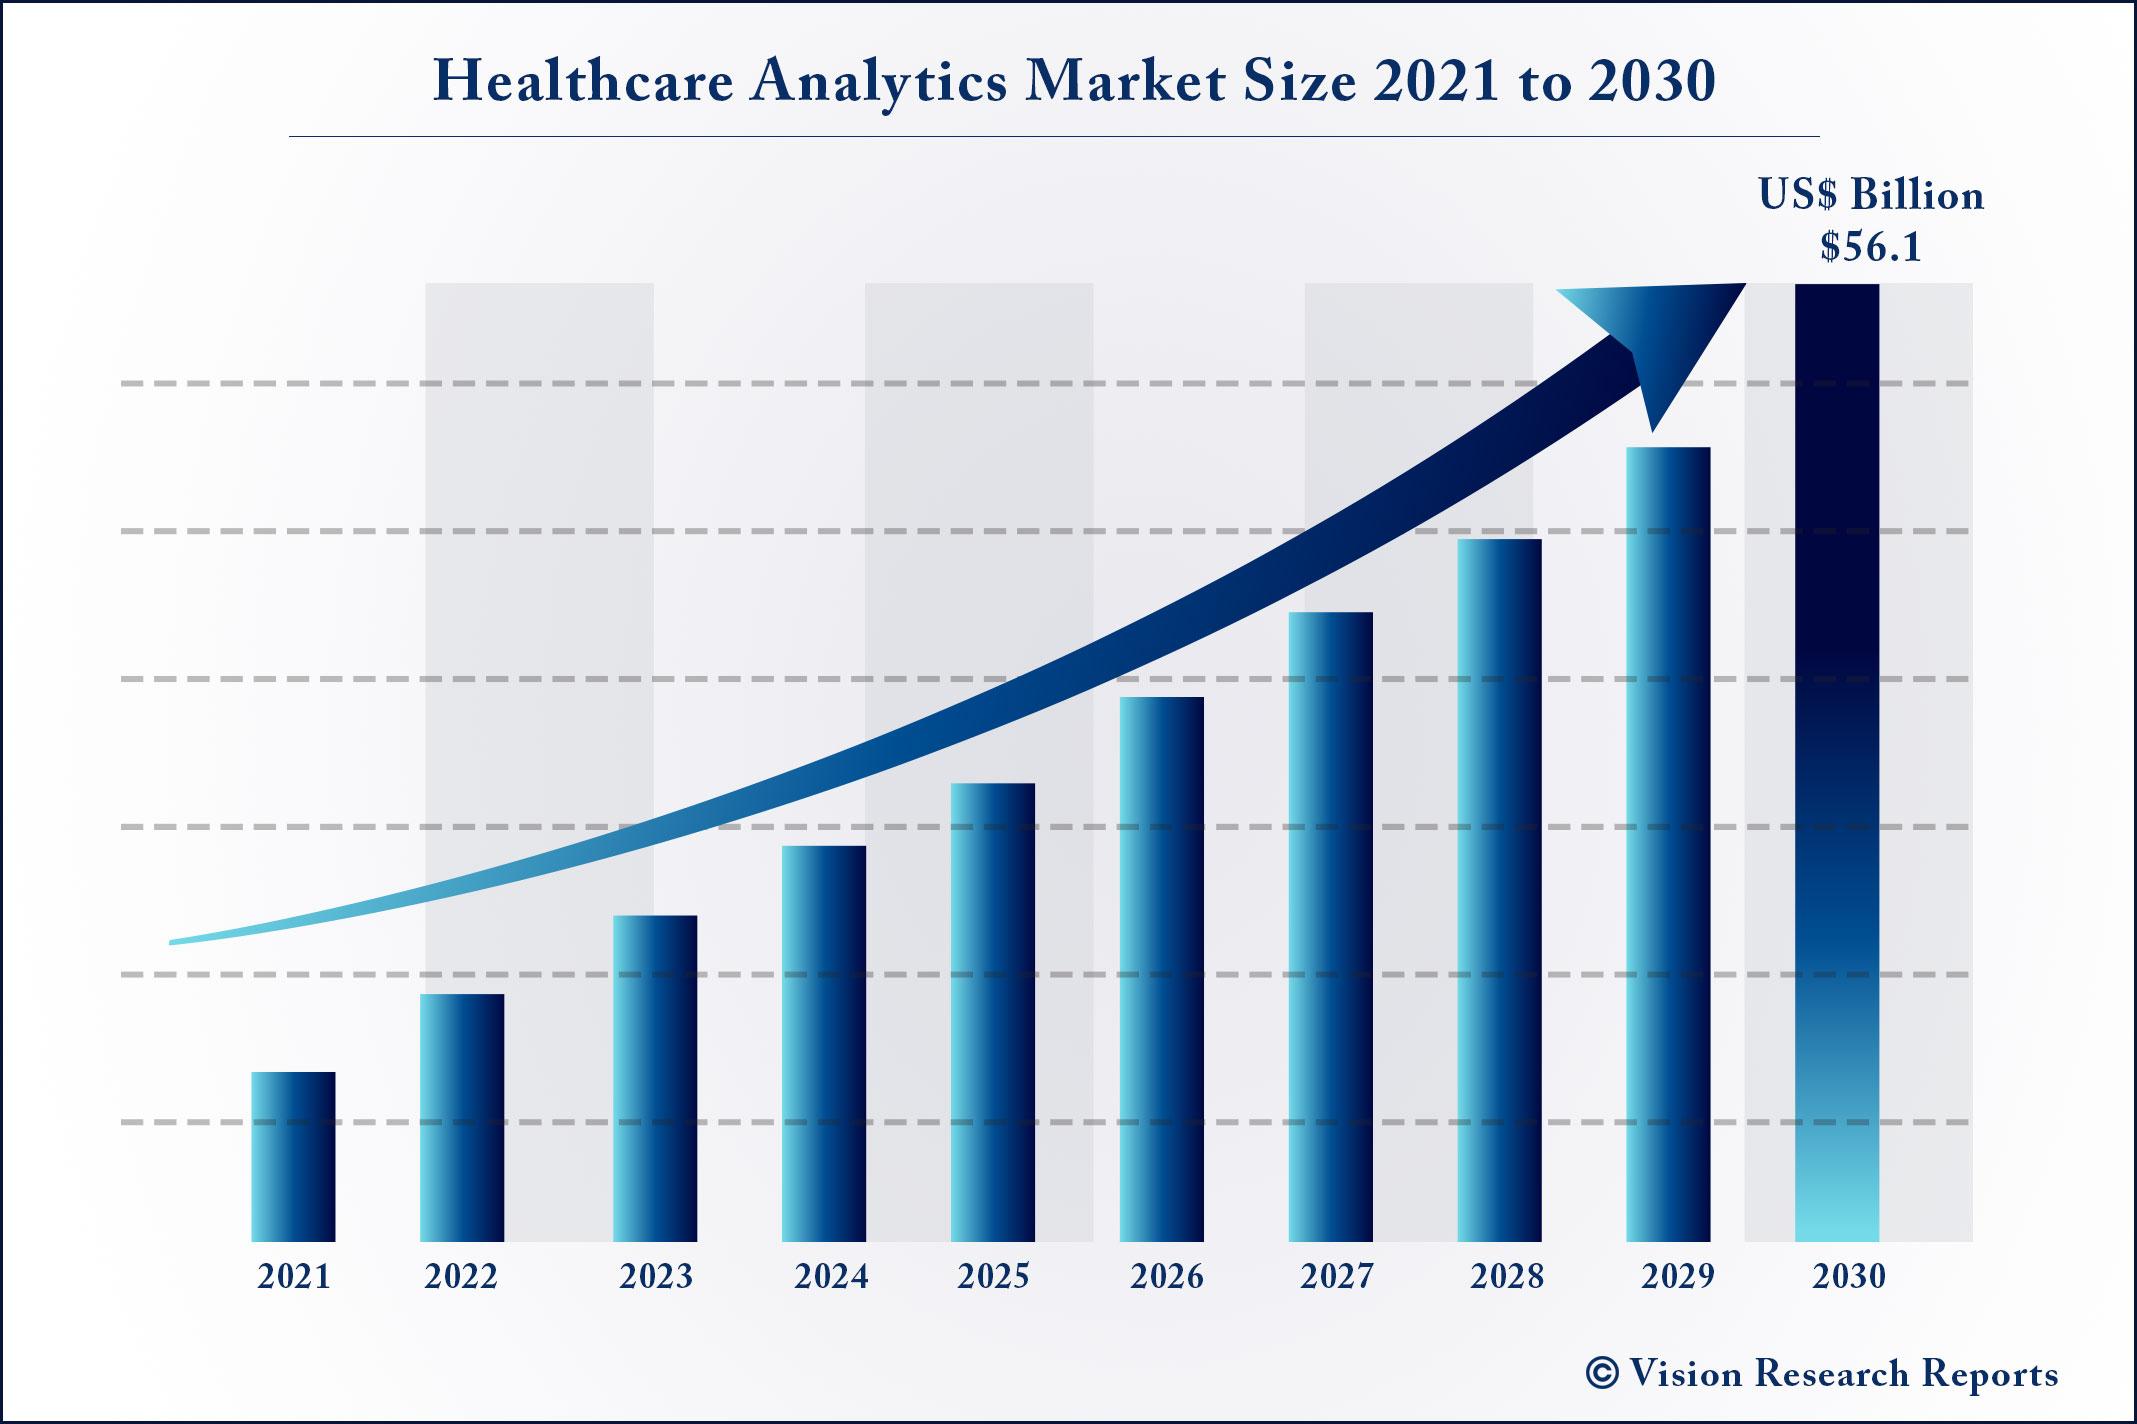 Healthcare Analytics Market Size 2021 to 2030